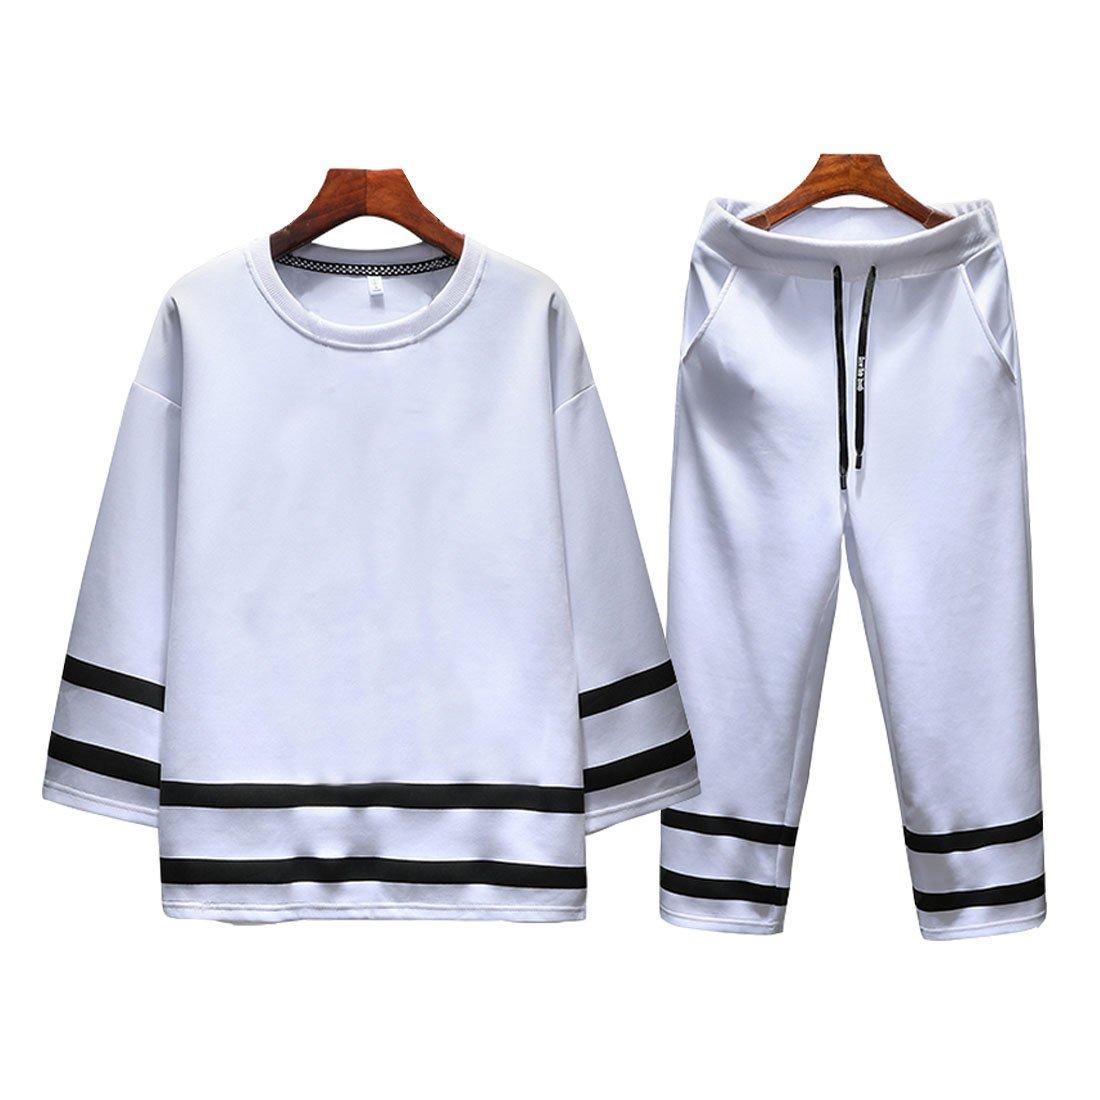 Hzcx Fashion Men's Summer Pullover Stripped Casual 2PCS Sets T Shirts and Pants DSA118-B1118-55-W-US M TAG XL